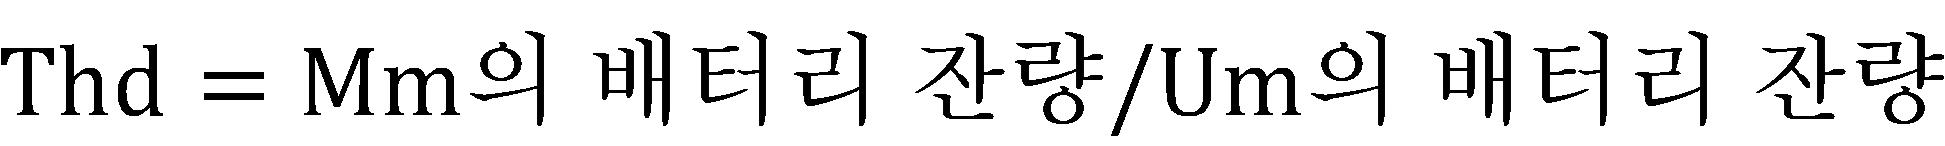 Figure 112013018841538-pat00012